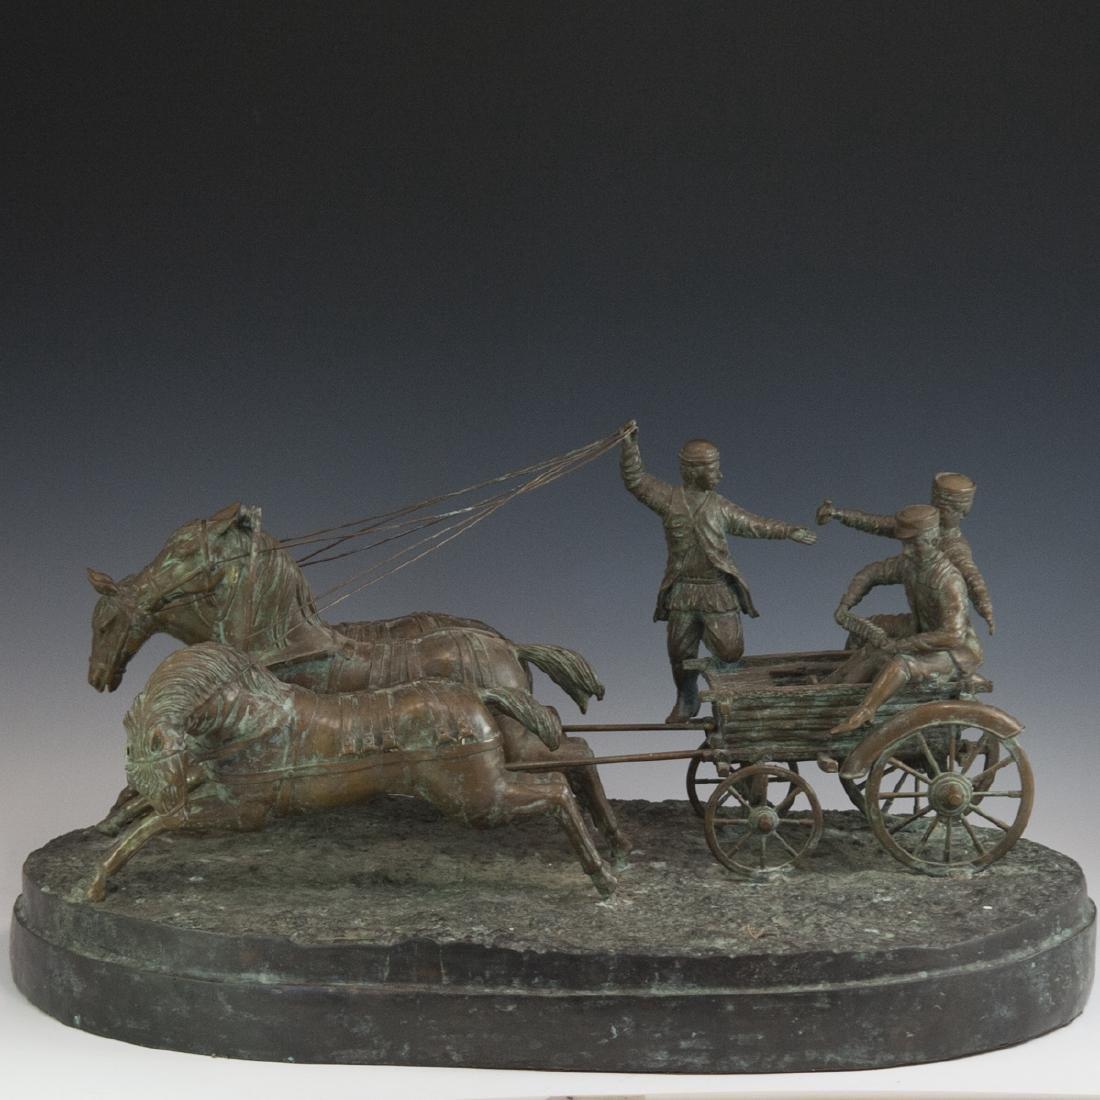 Antique Russian Figural Bronze Sculpture - 4